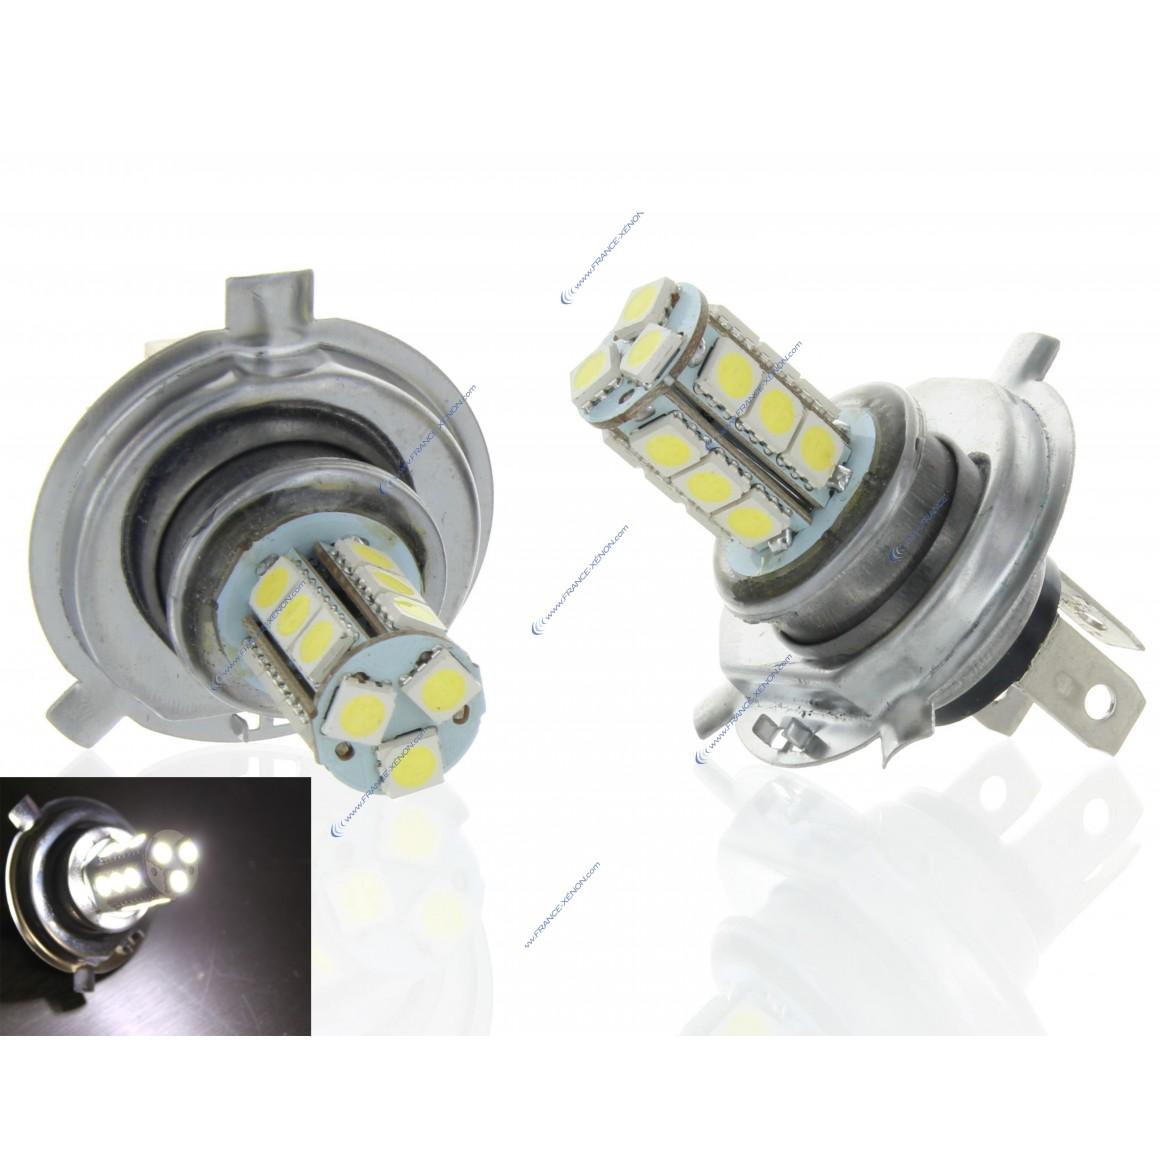 2 x 24v Glühbirnen h4 - SMD LED 18 LED